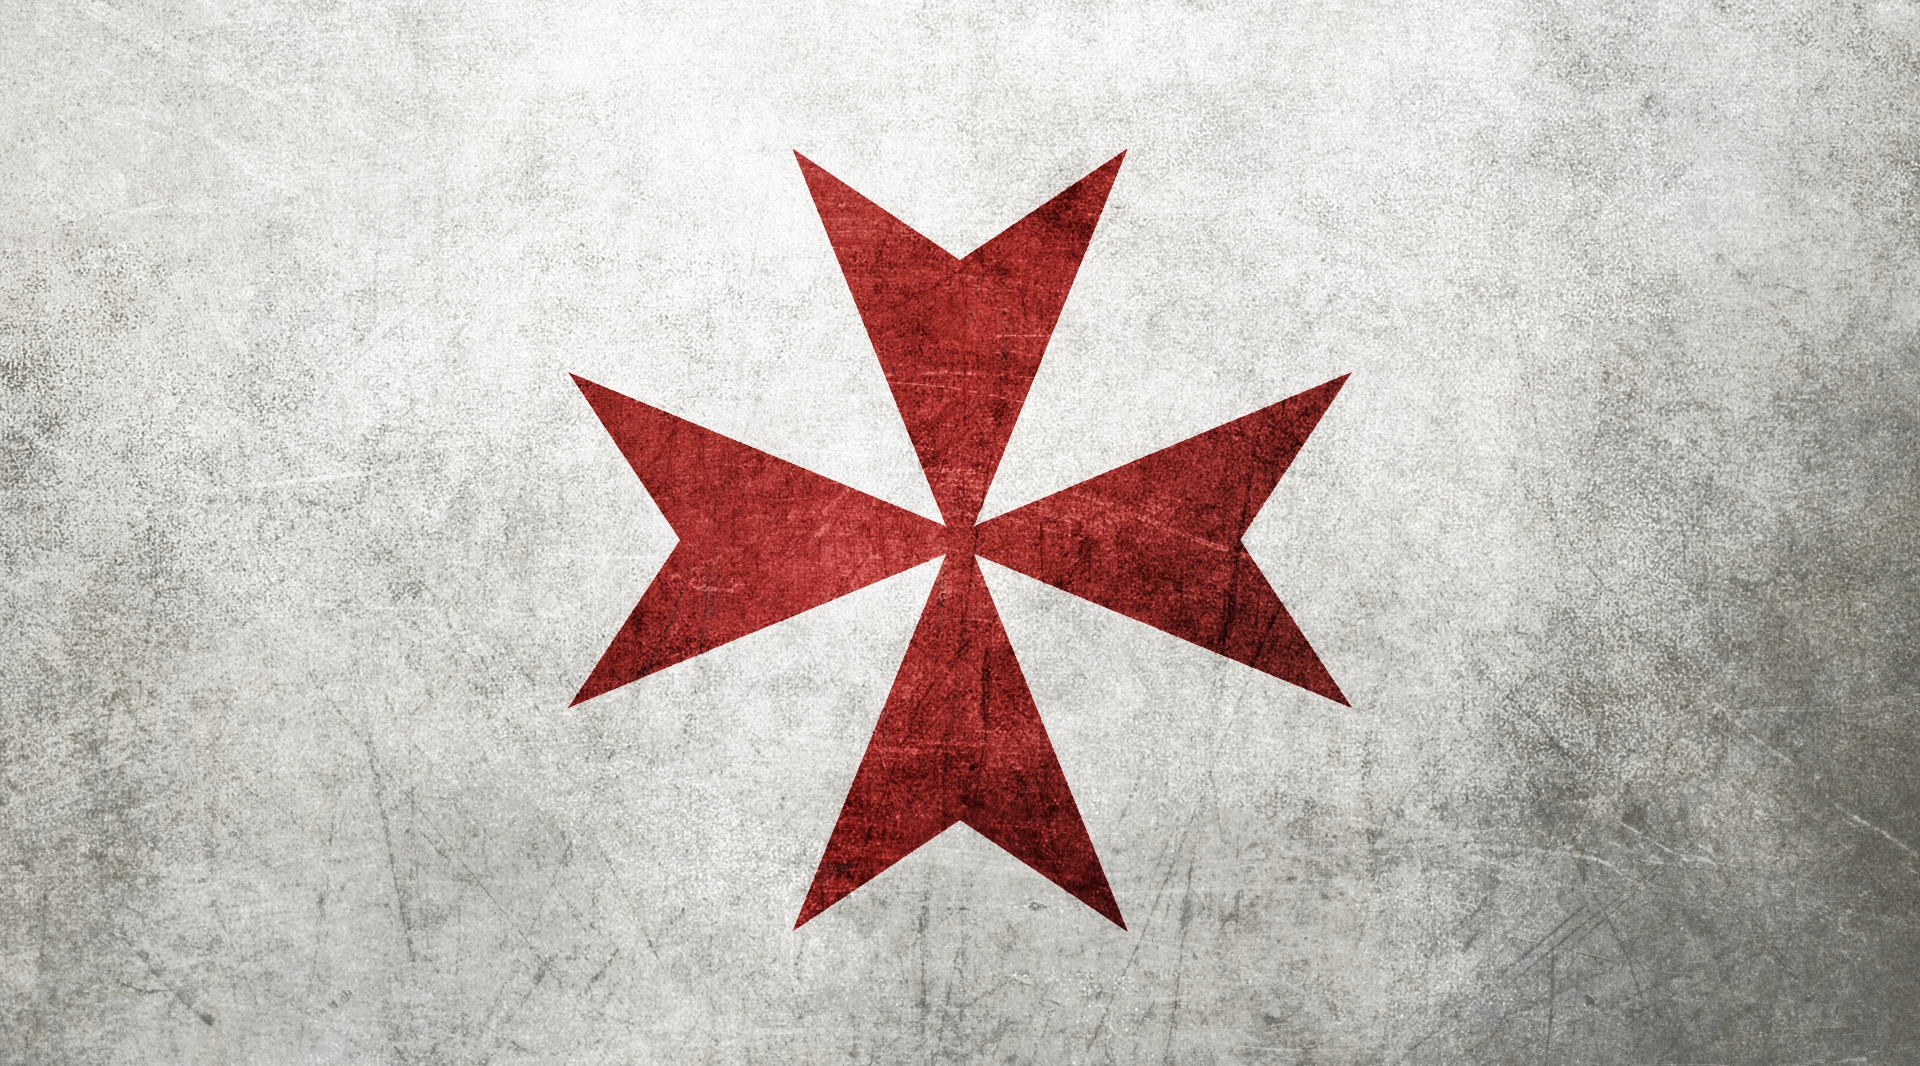 Knights Templar Wallpaper Iphone Cross Backgrounds Pixelstalk Net